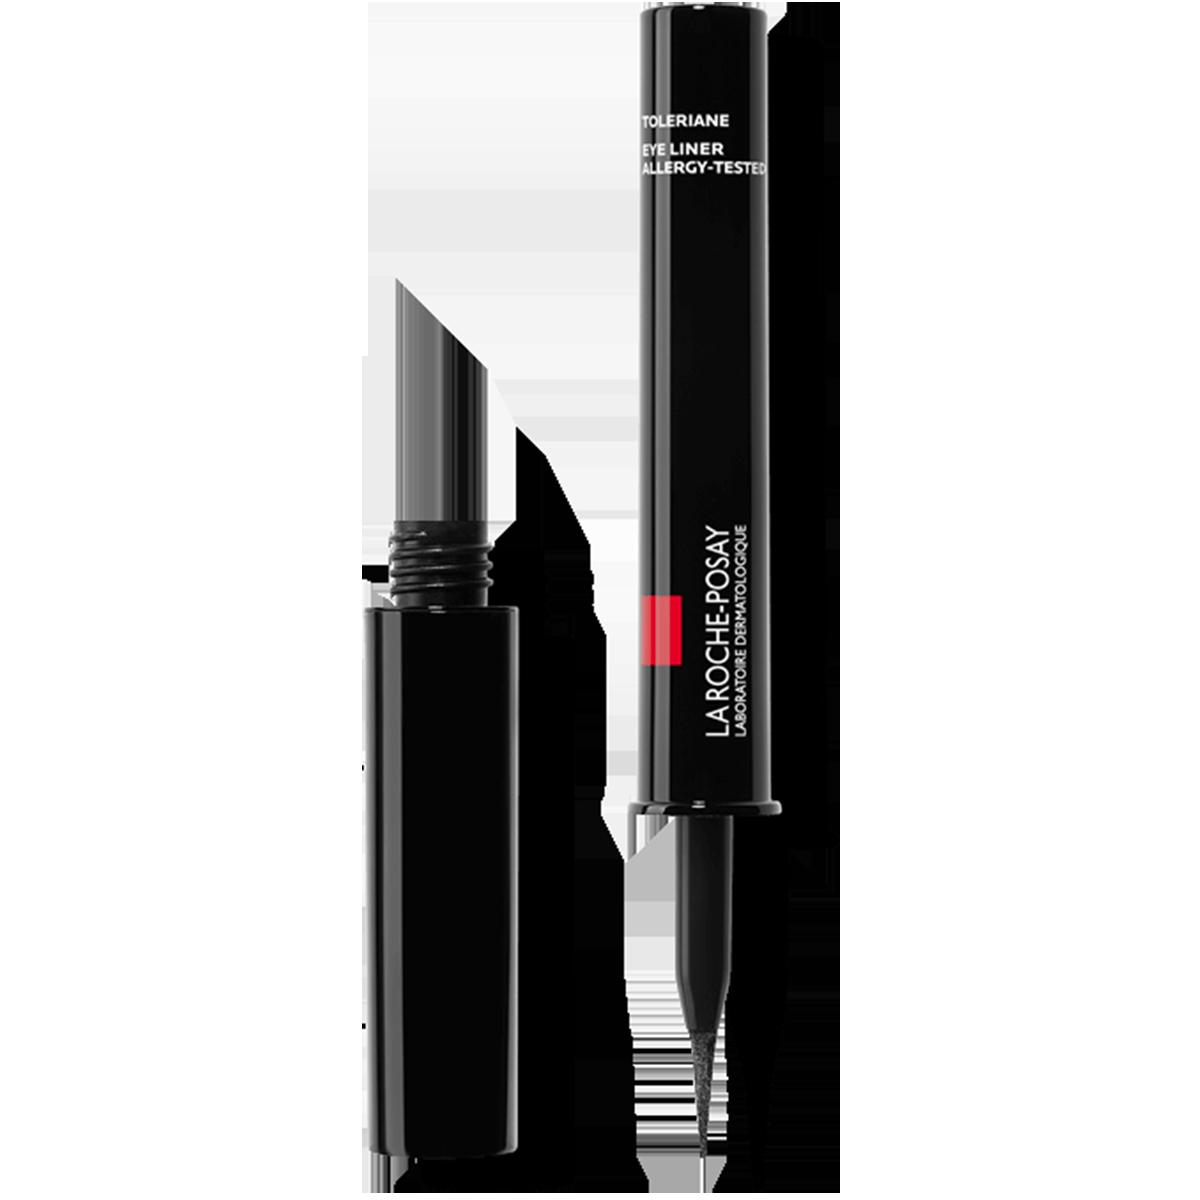 La Roche Posay Herkkä Toleriane Make up EYELINER Black 343342240304